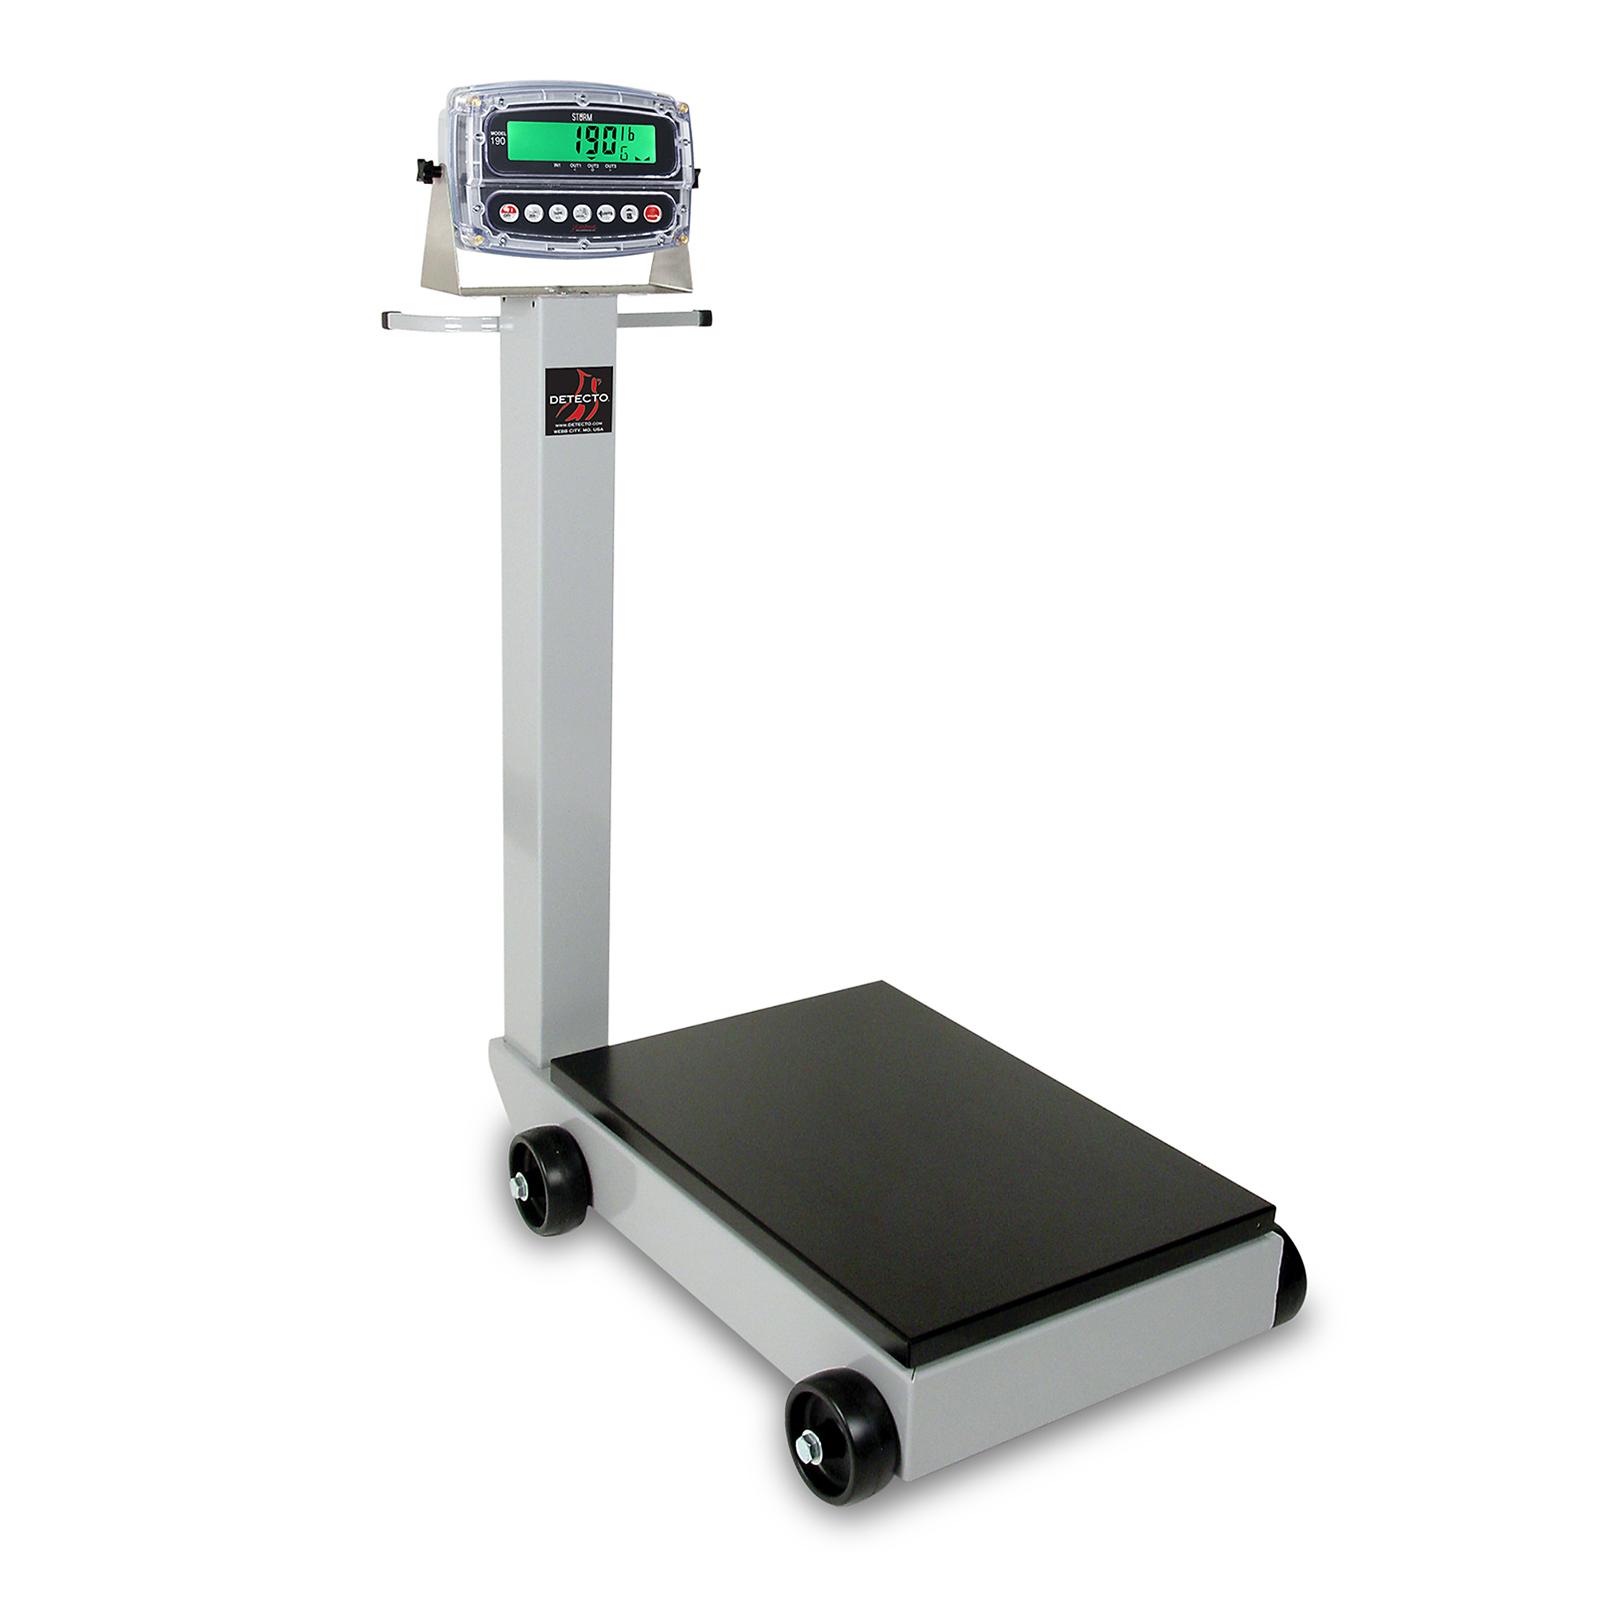 Detecto 5852F-190 scale, receiving, digital